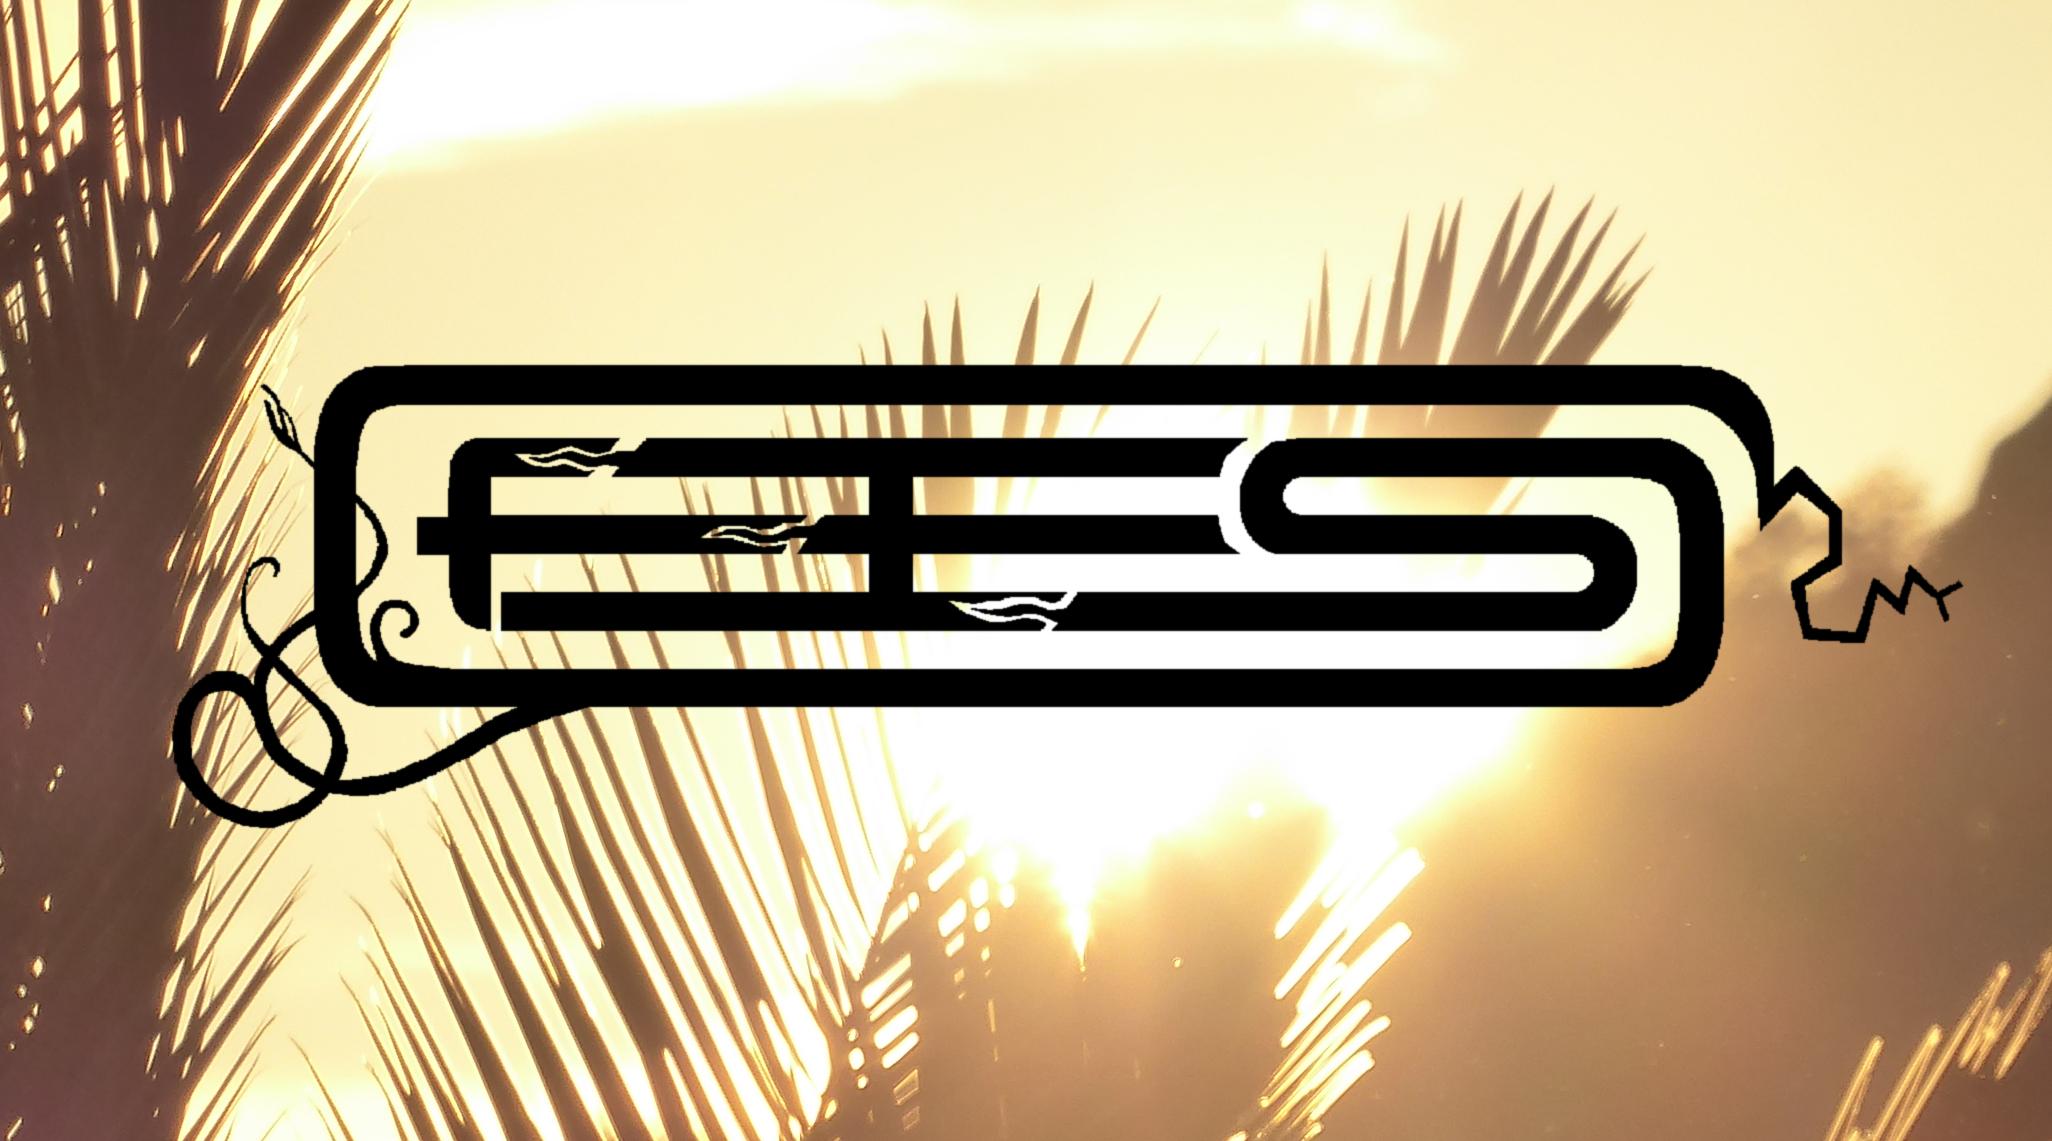 FES Free Eclectic Spirit - Bandlogo